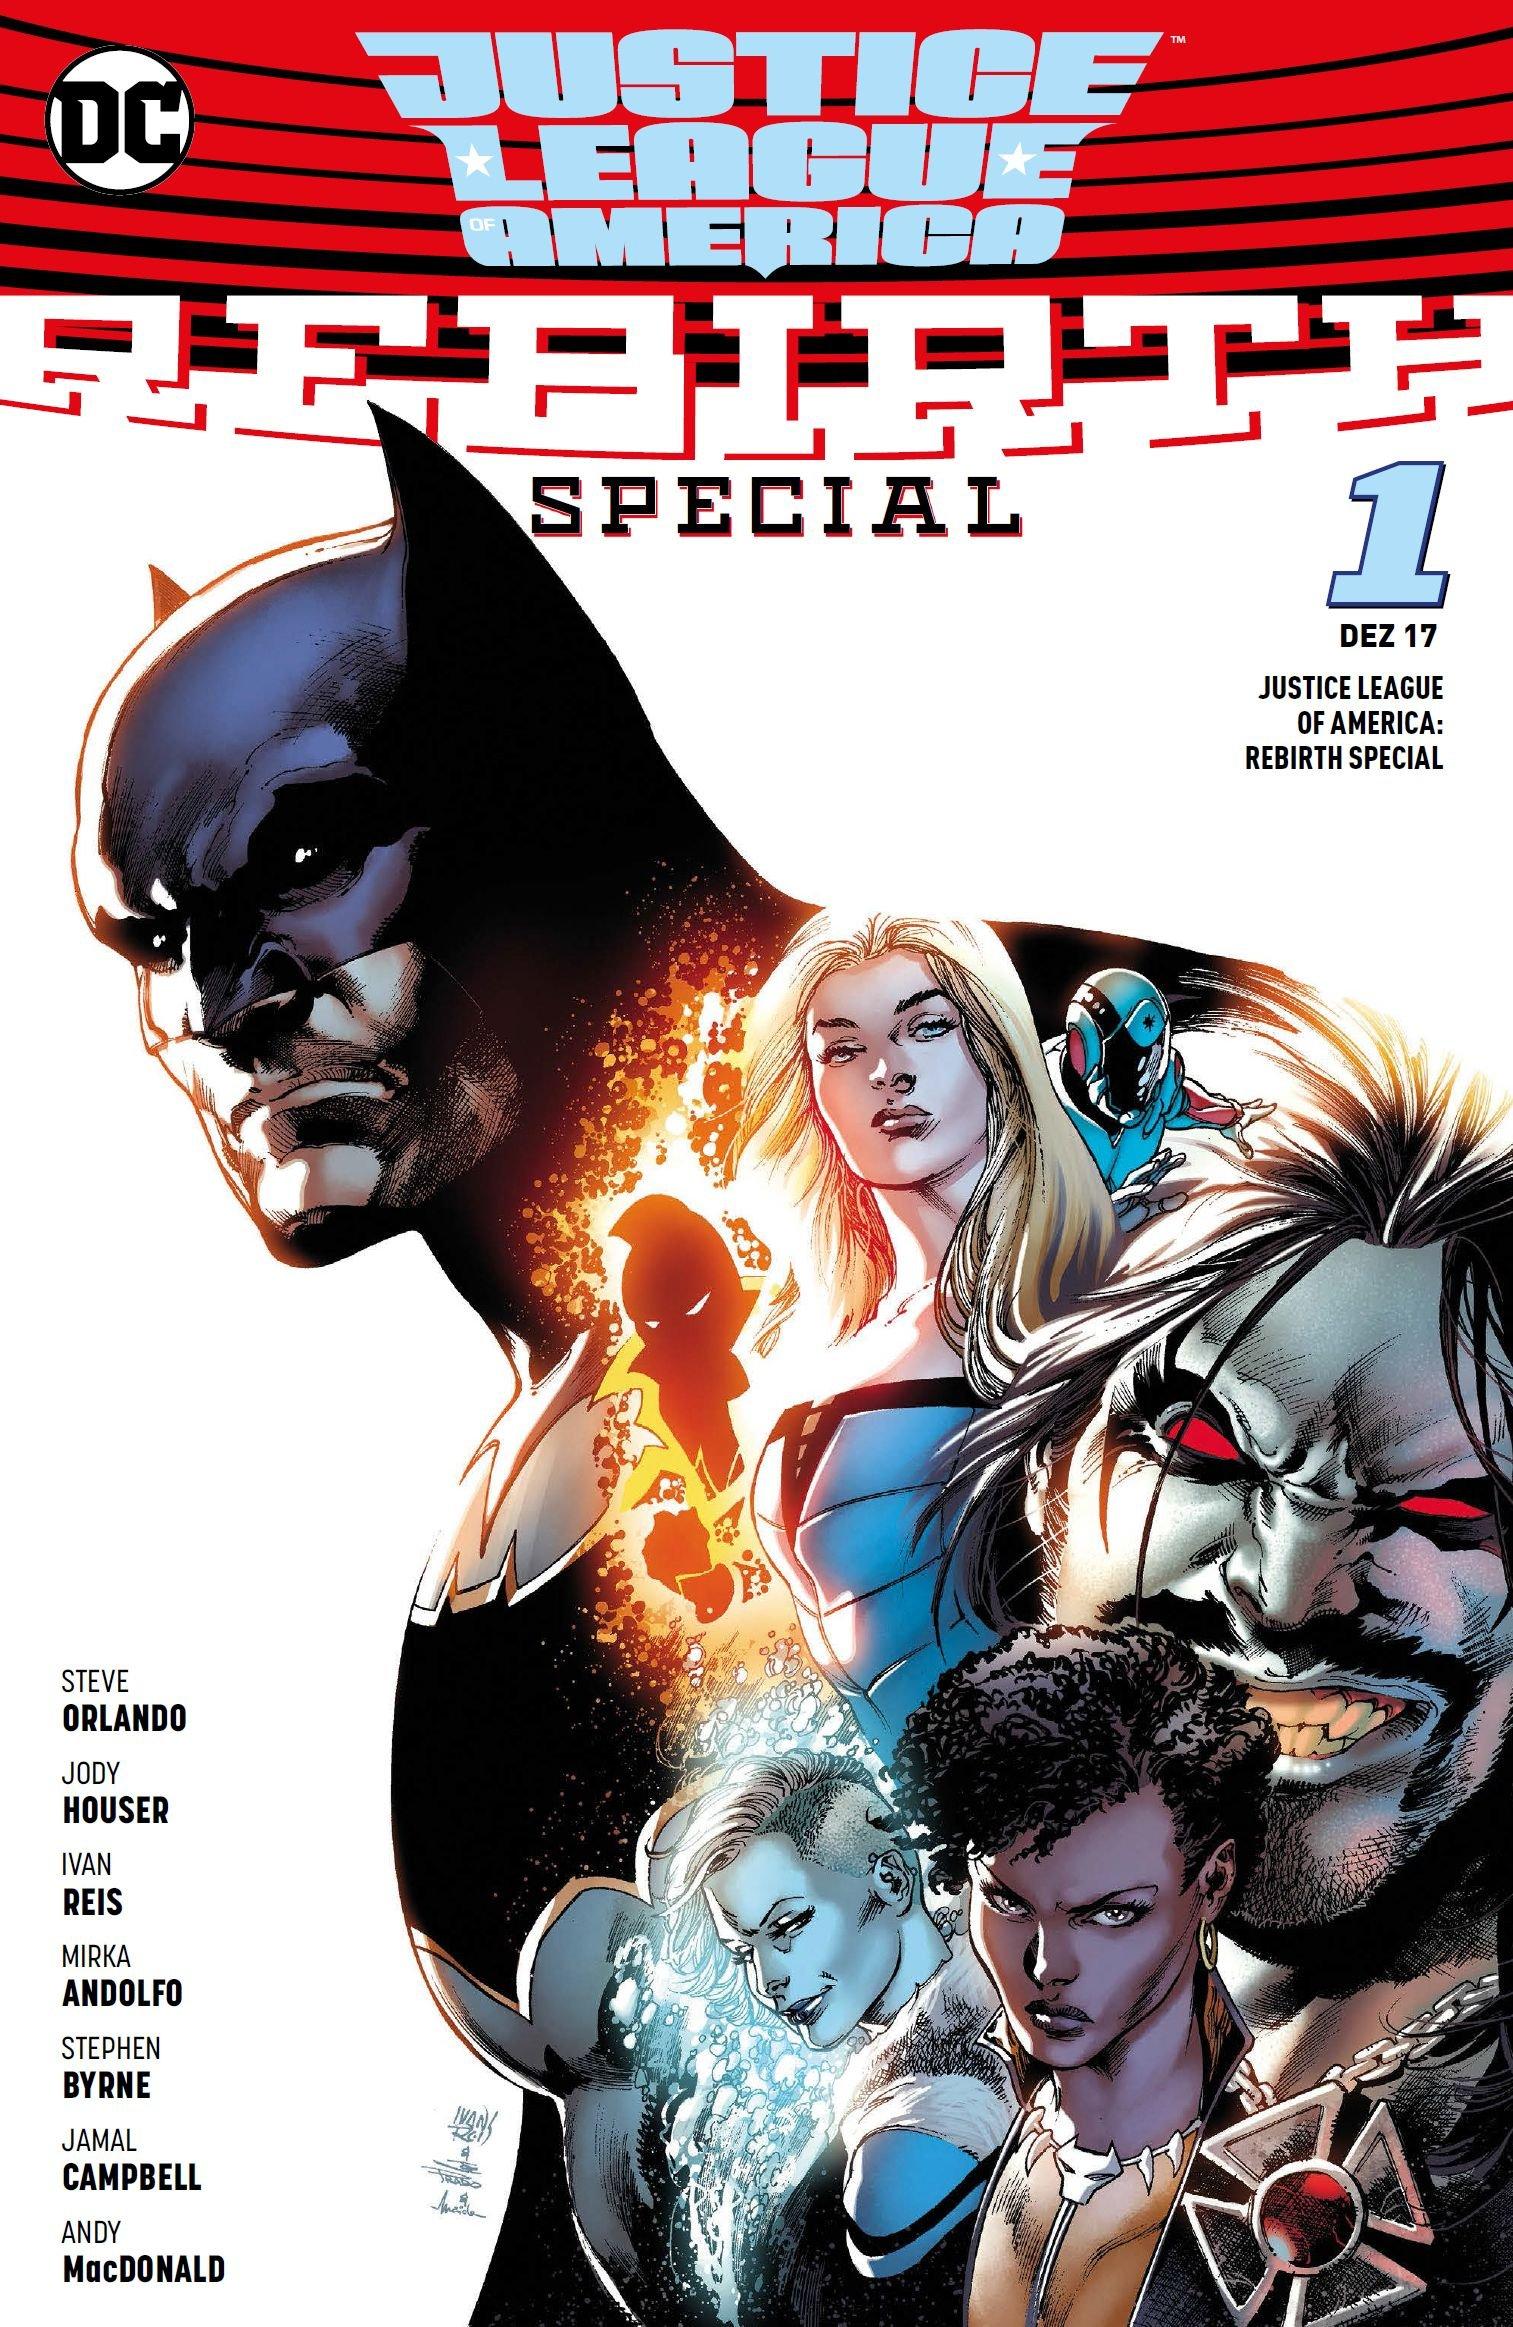 Justice League of America: Rebirth Special Taschenbuch – 13. November 2017 Steve Orlando Ivan Reis Carolin Hidalgo Jody Houser